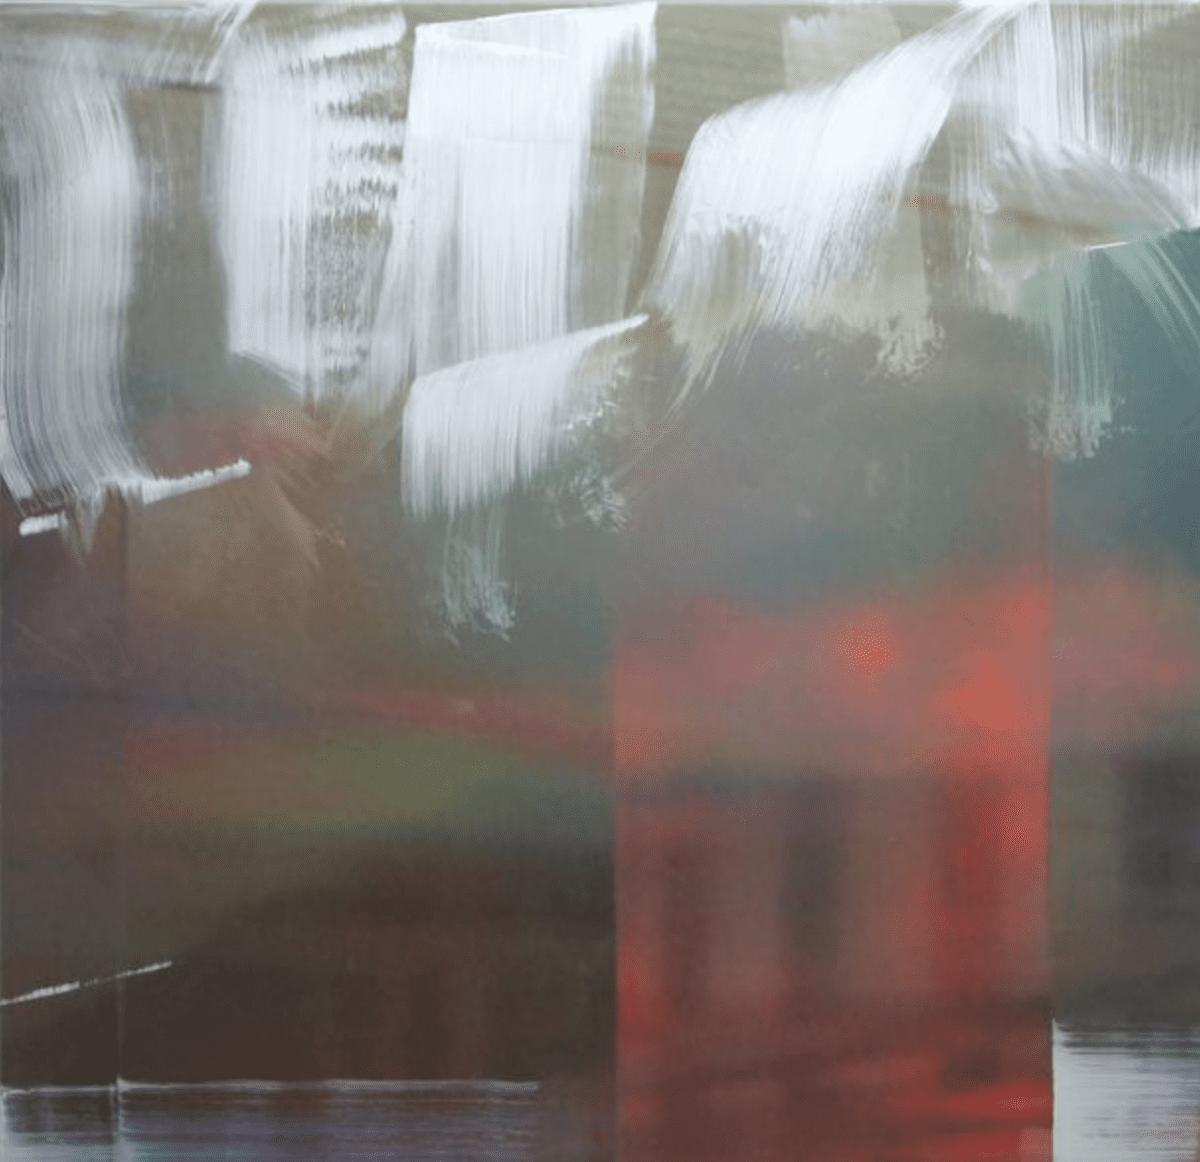 "Justine Frischmann, Lambent #83, oil, acrylic spray enamel over sublimation print on aluminum, 40"" x 40,"" 2016."